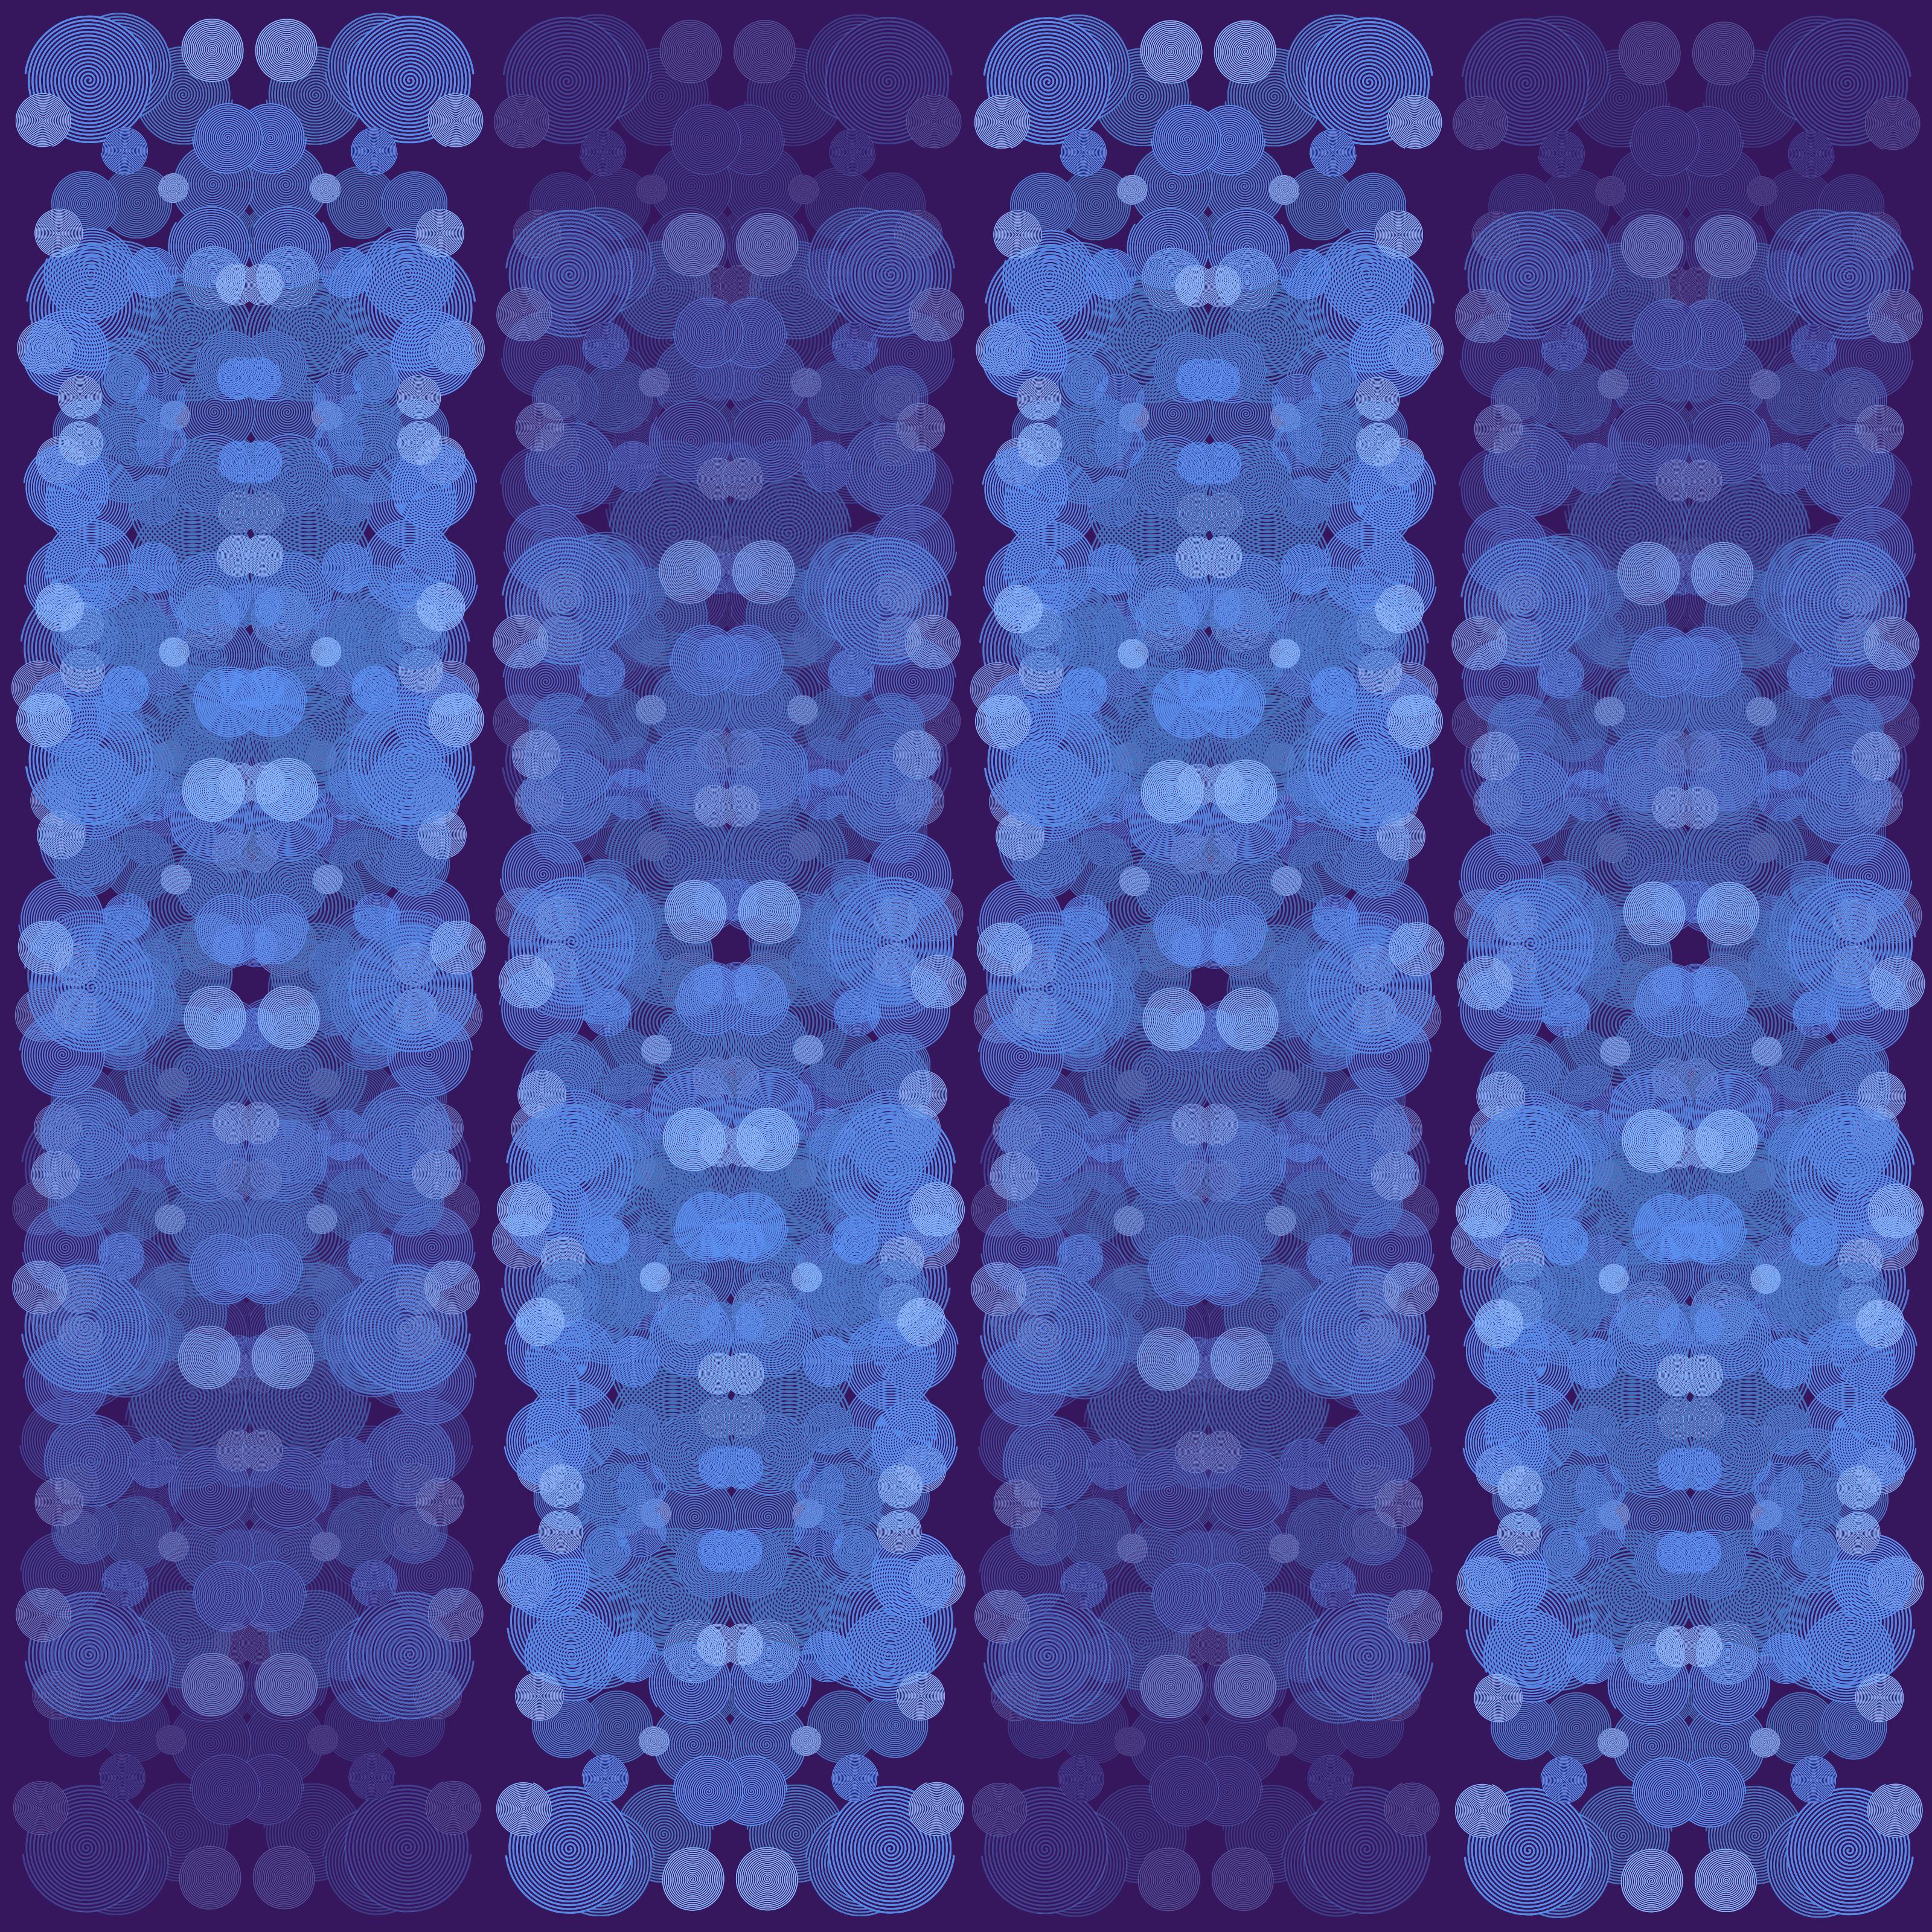 Blue Fade Fabric